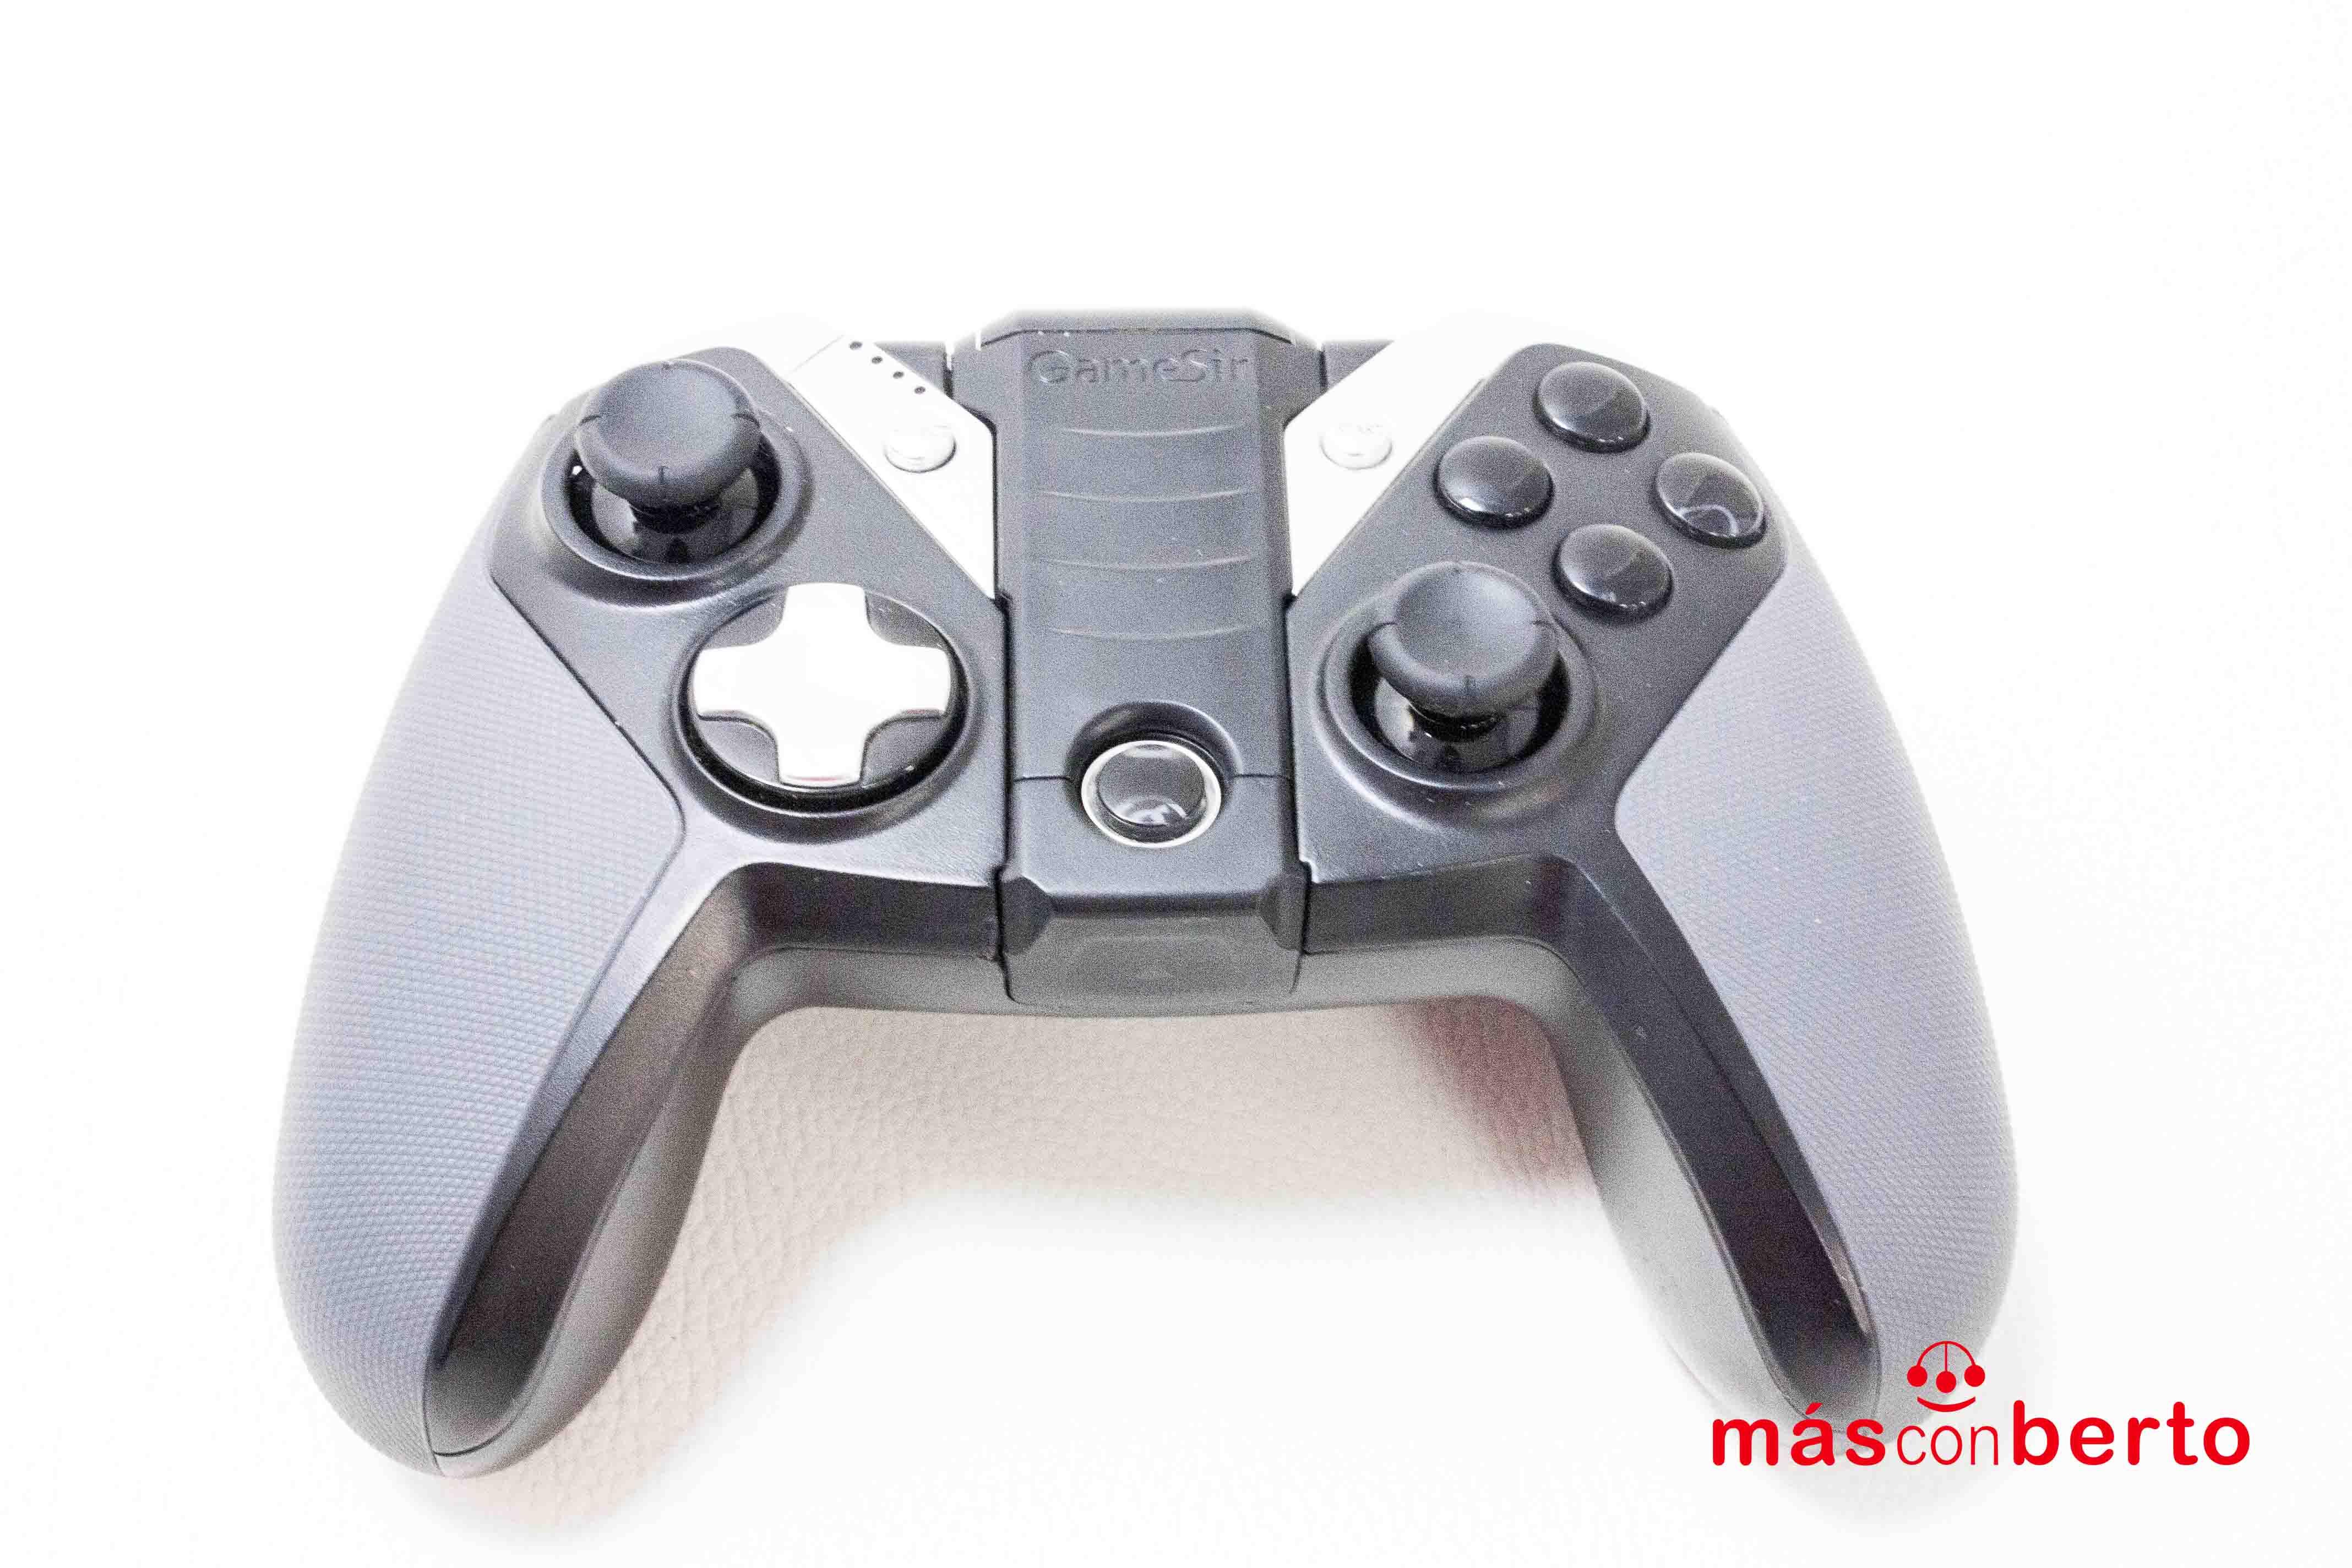 Mando compatible GameSir...